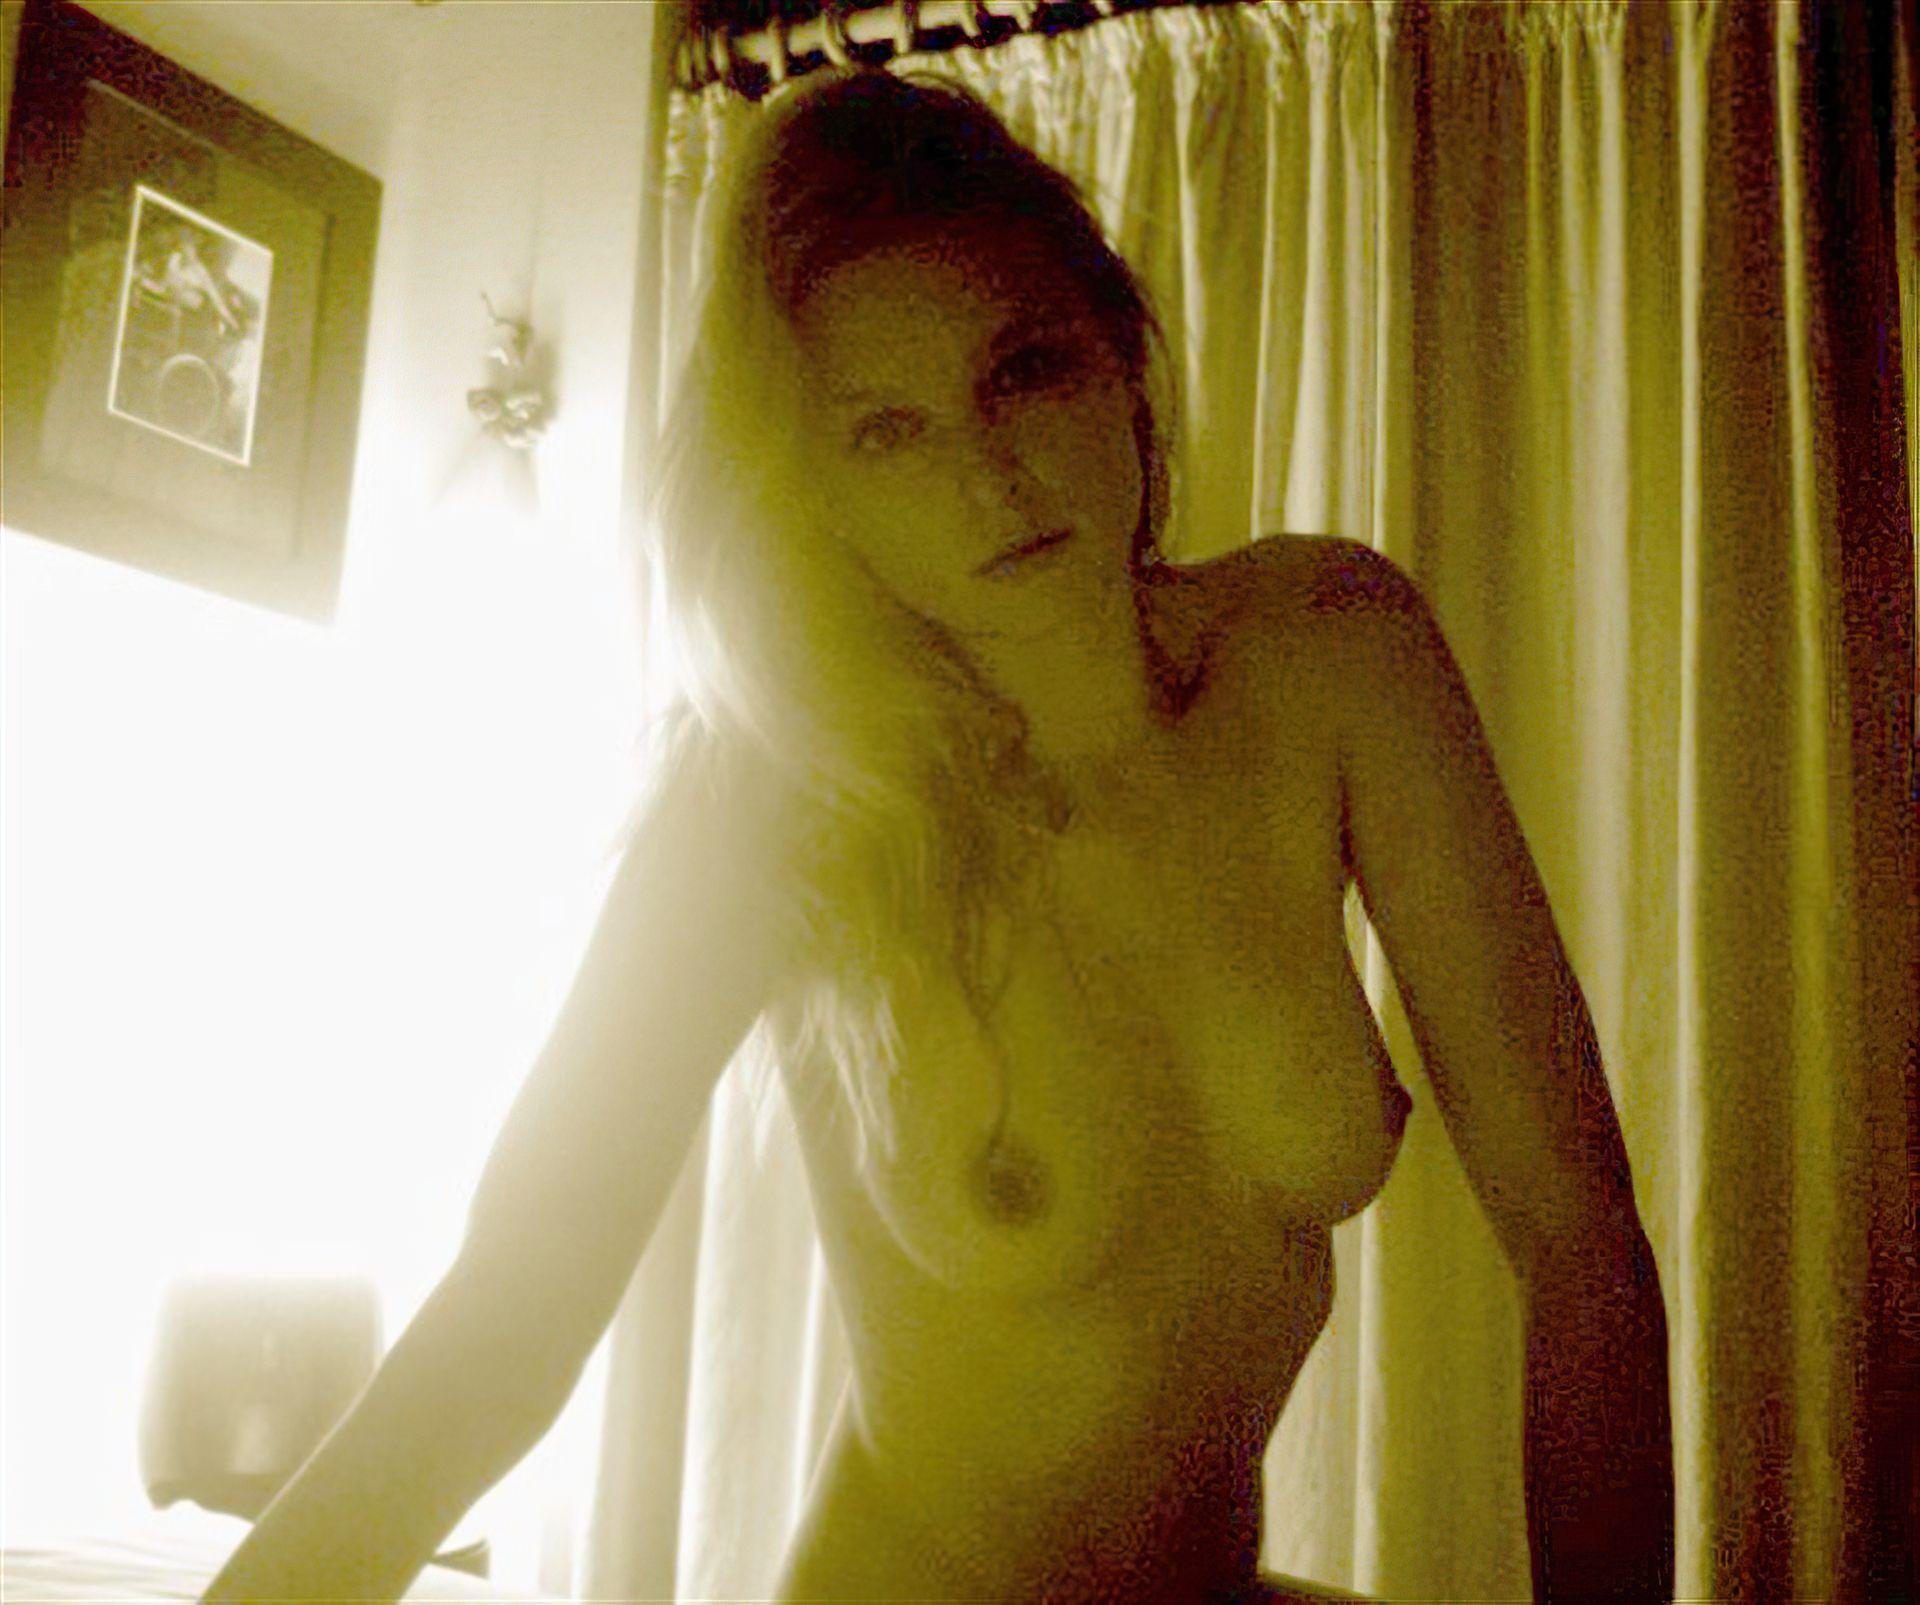 Groups Free Nude Celebrities